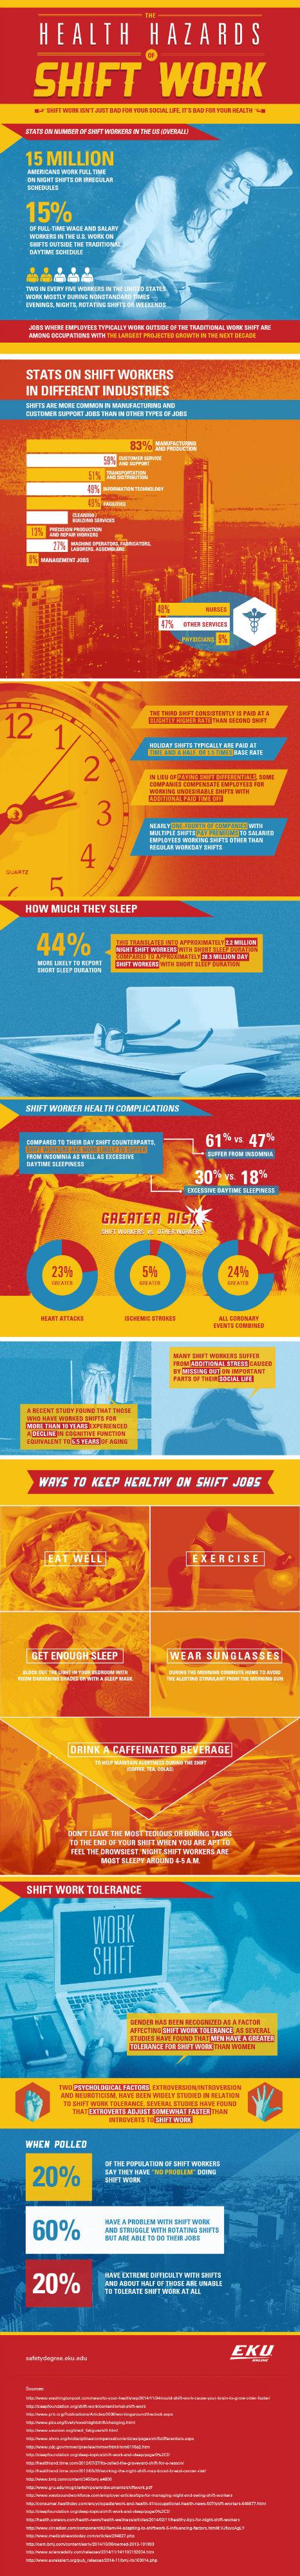 Health Hazards of Shift Work [Infographic]